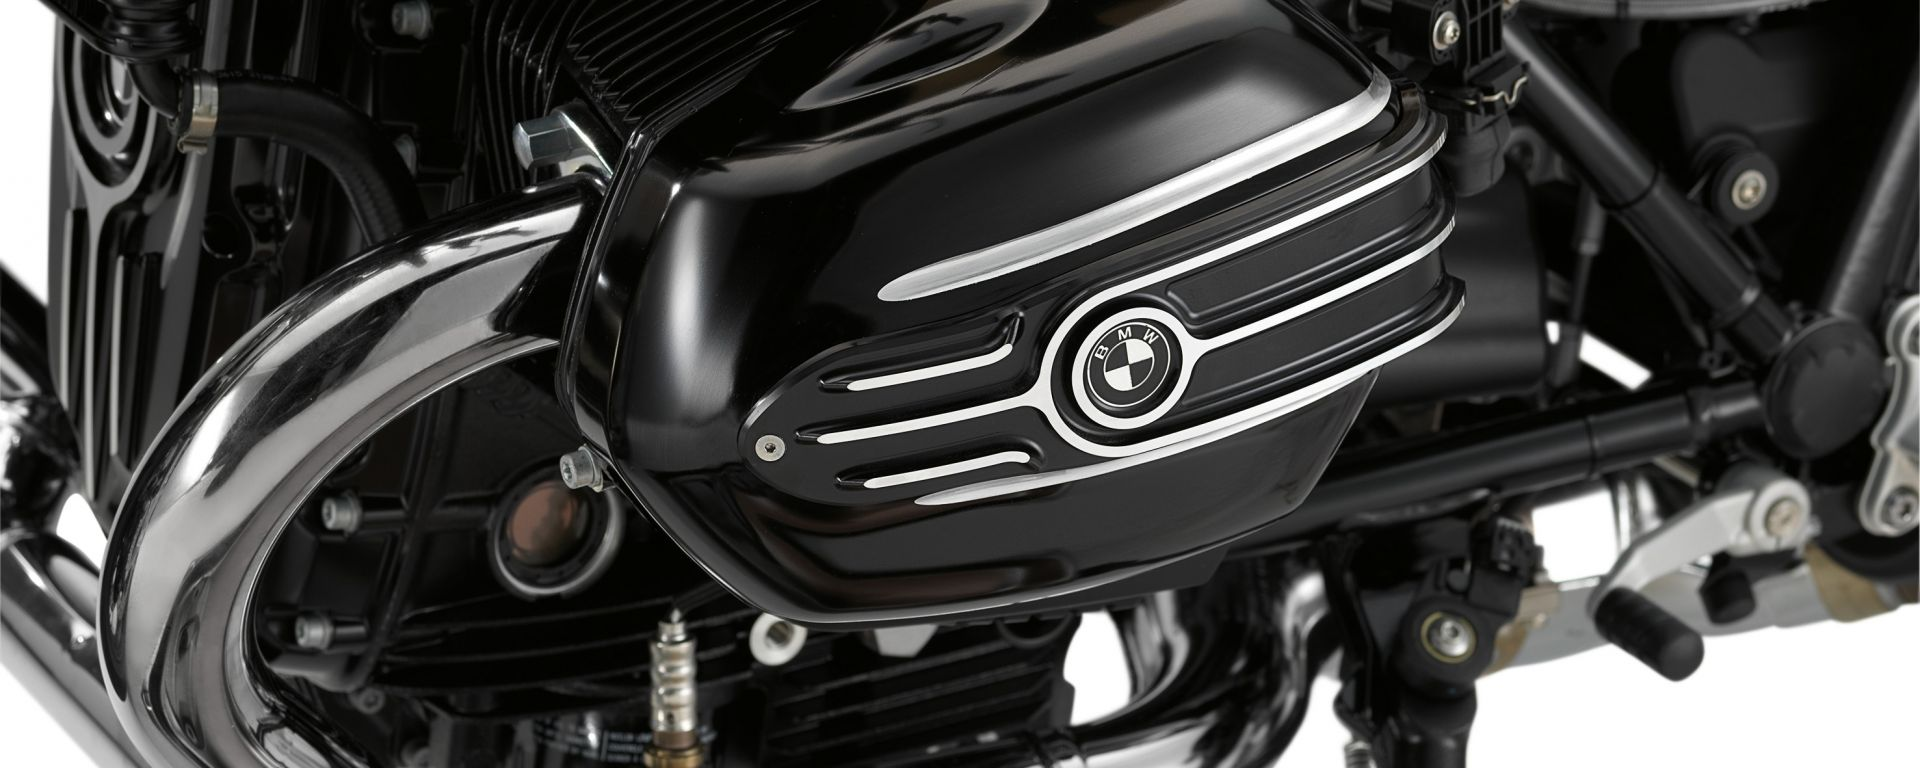 BMW Motorrad Machined Parts, coperchi cilindro